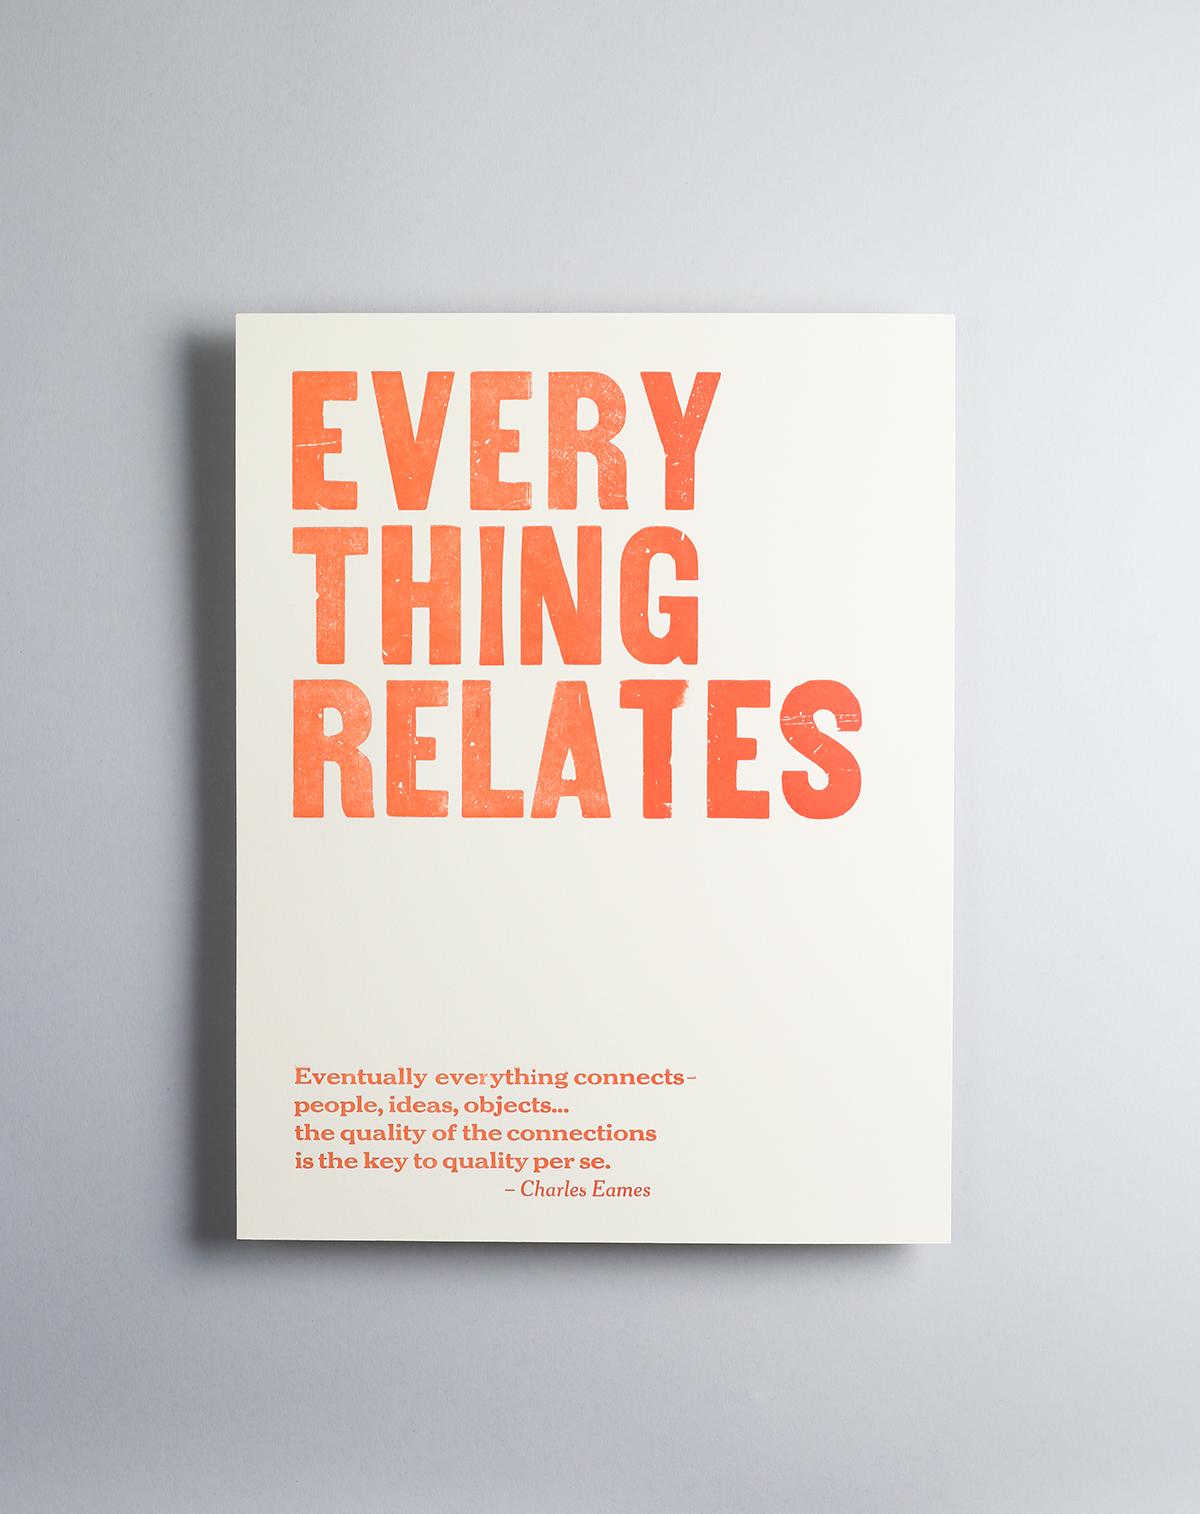 letterpress vandercook cyderling centerofbook print poster literature